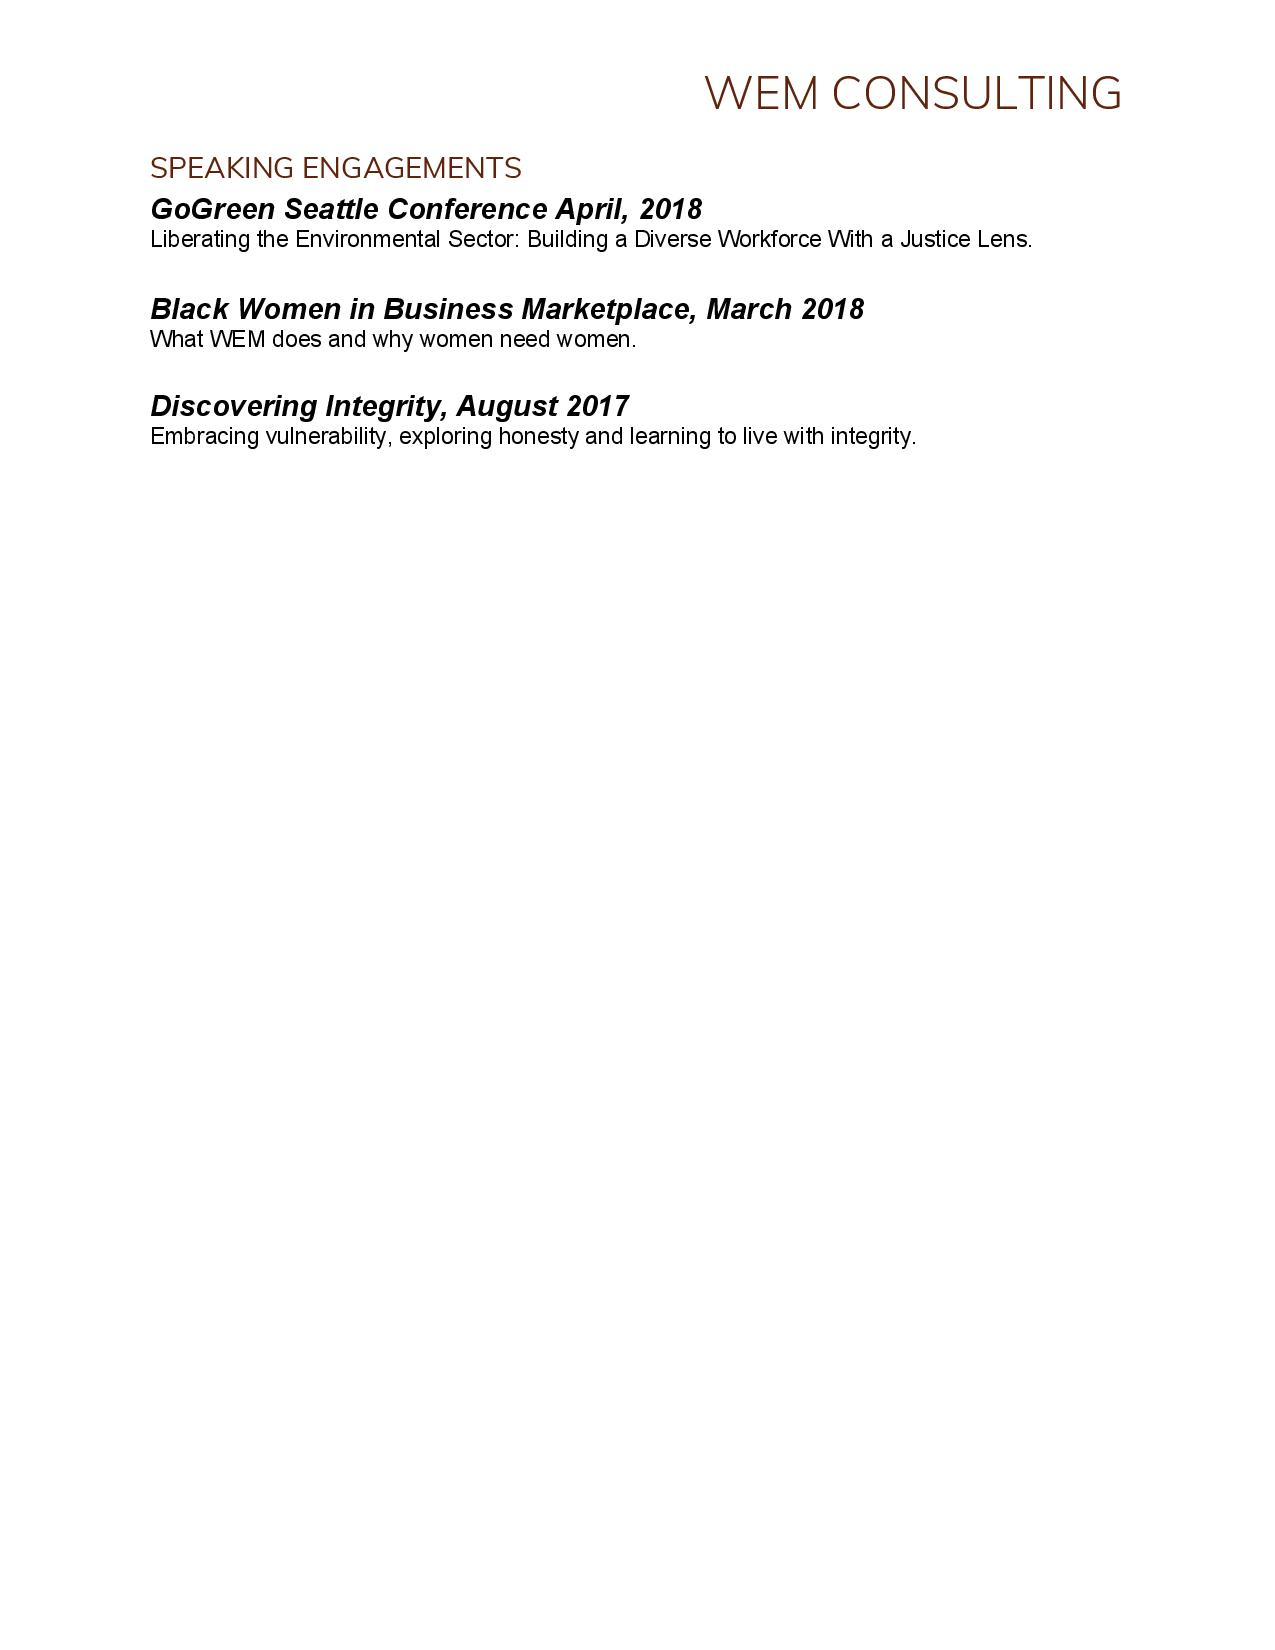 WEM Consulting Resume v4-06-2018 -page-4.jpg